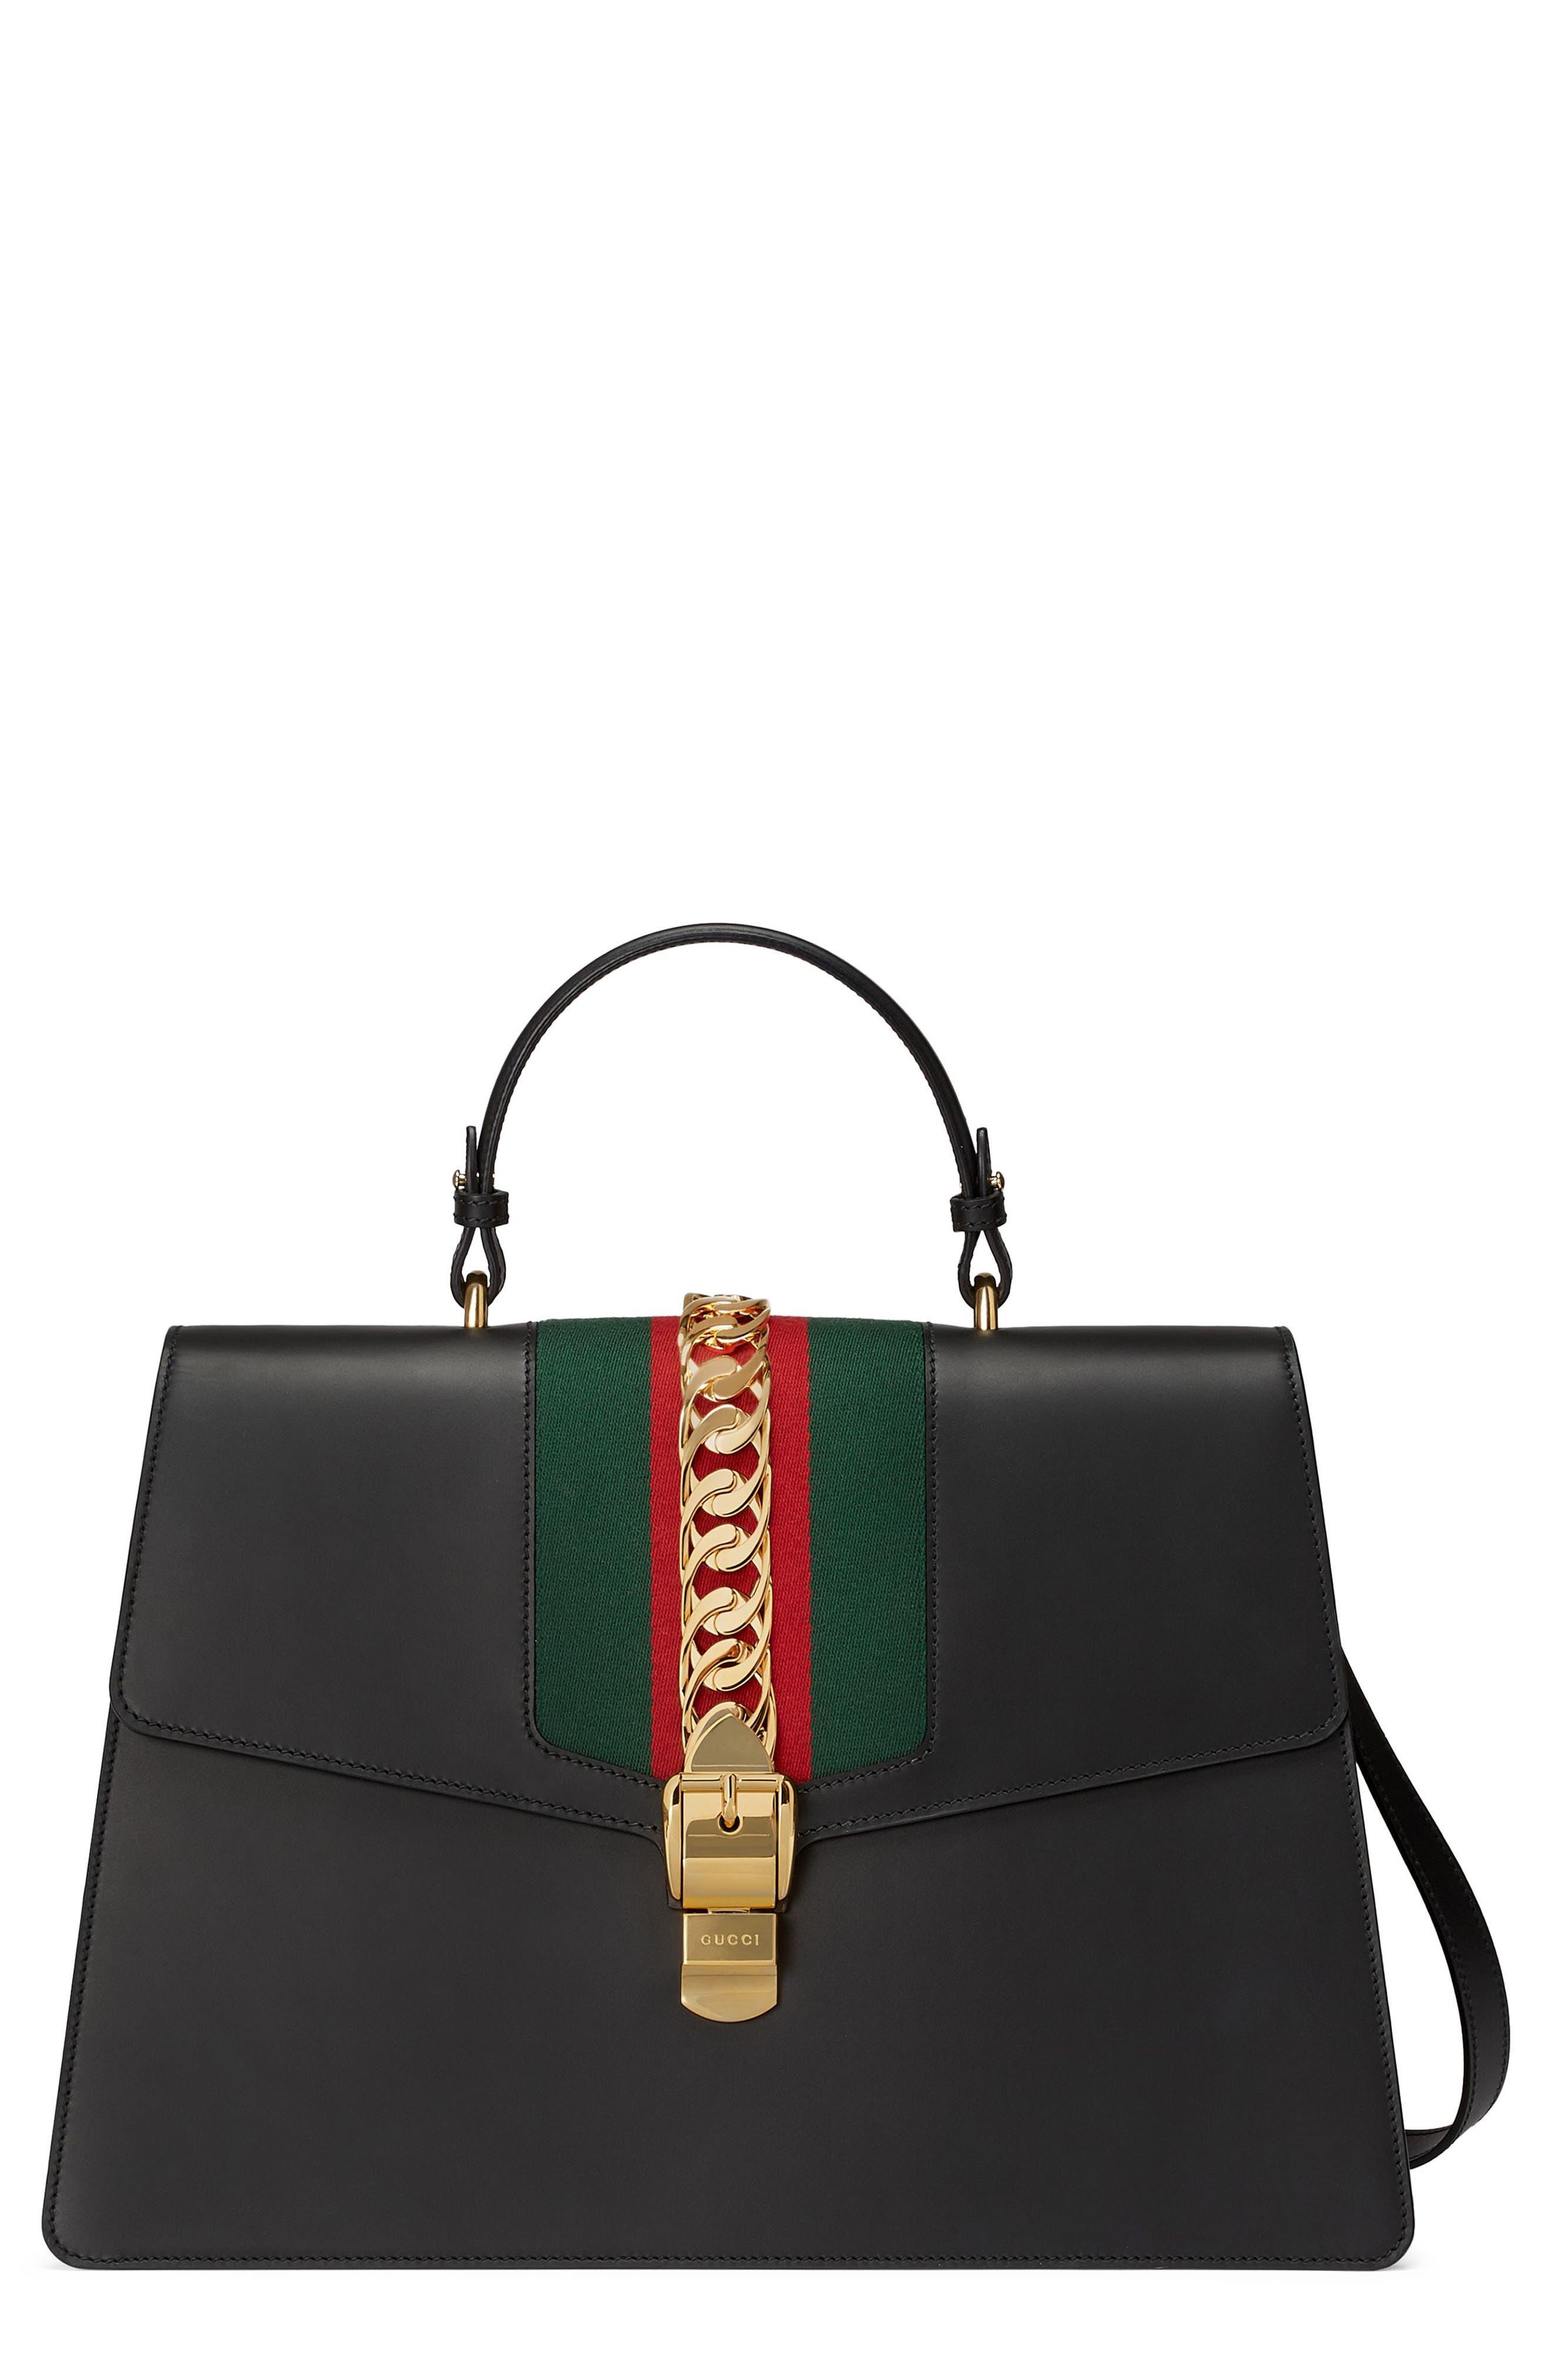 Maxi Sylvie Top Handle Leather Shoulder Bag,                         Main,                         color, NERO/ VERT RED